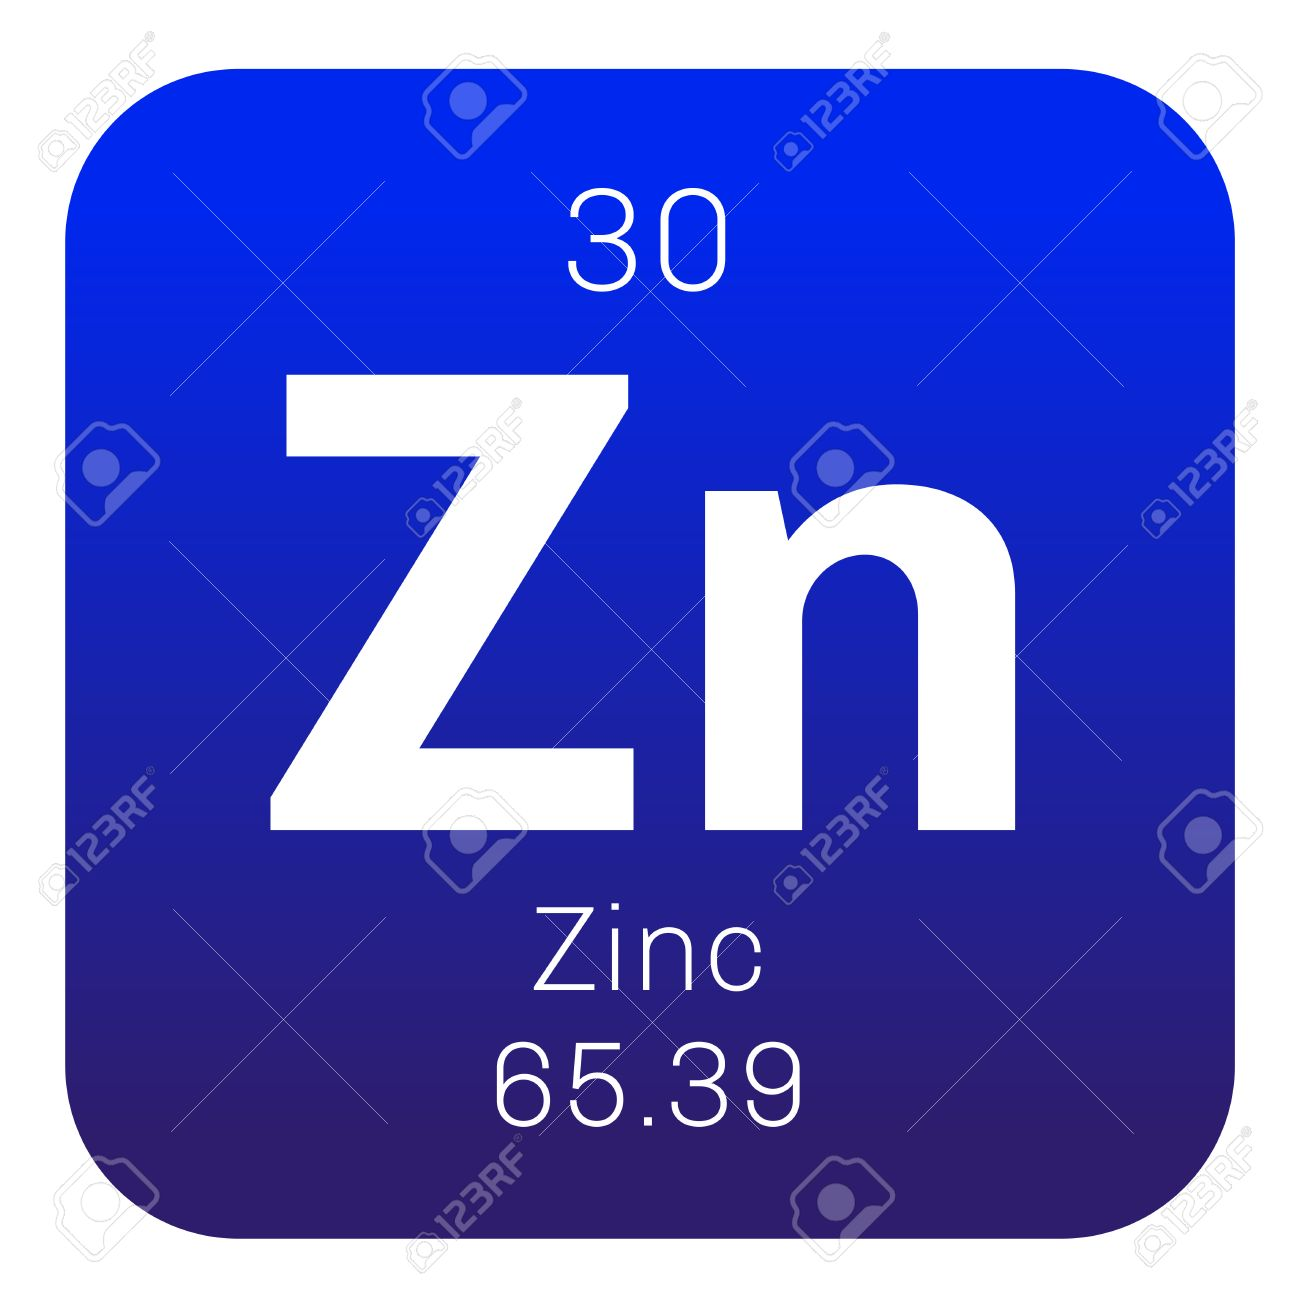 Zinc chemical element common element on earth colored icon zinc chemical element common element on earth colored icon with atomic number and atomic buycottarizona Gallery